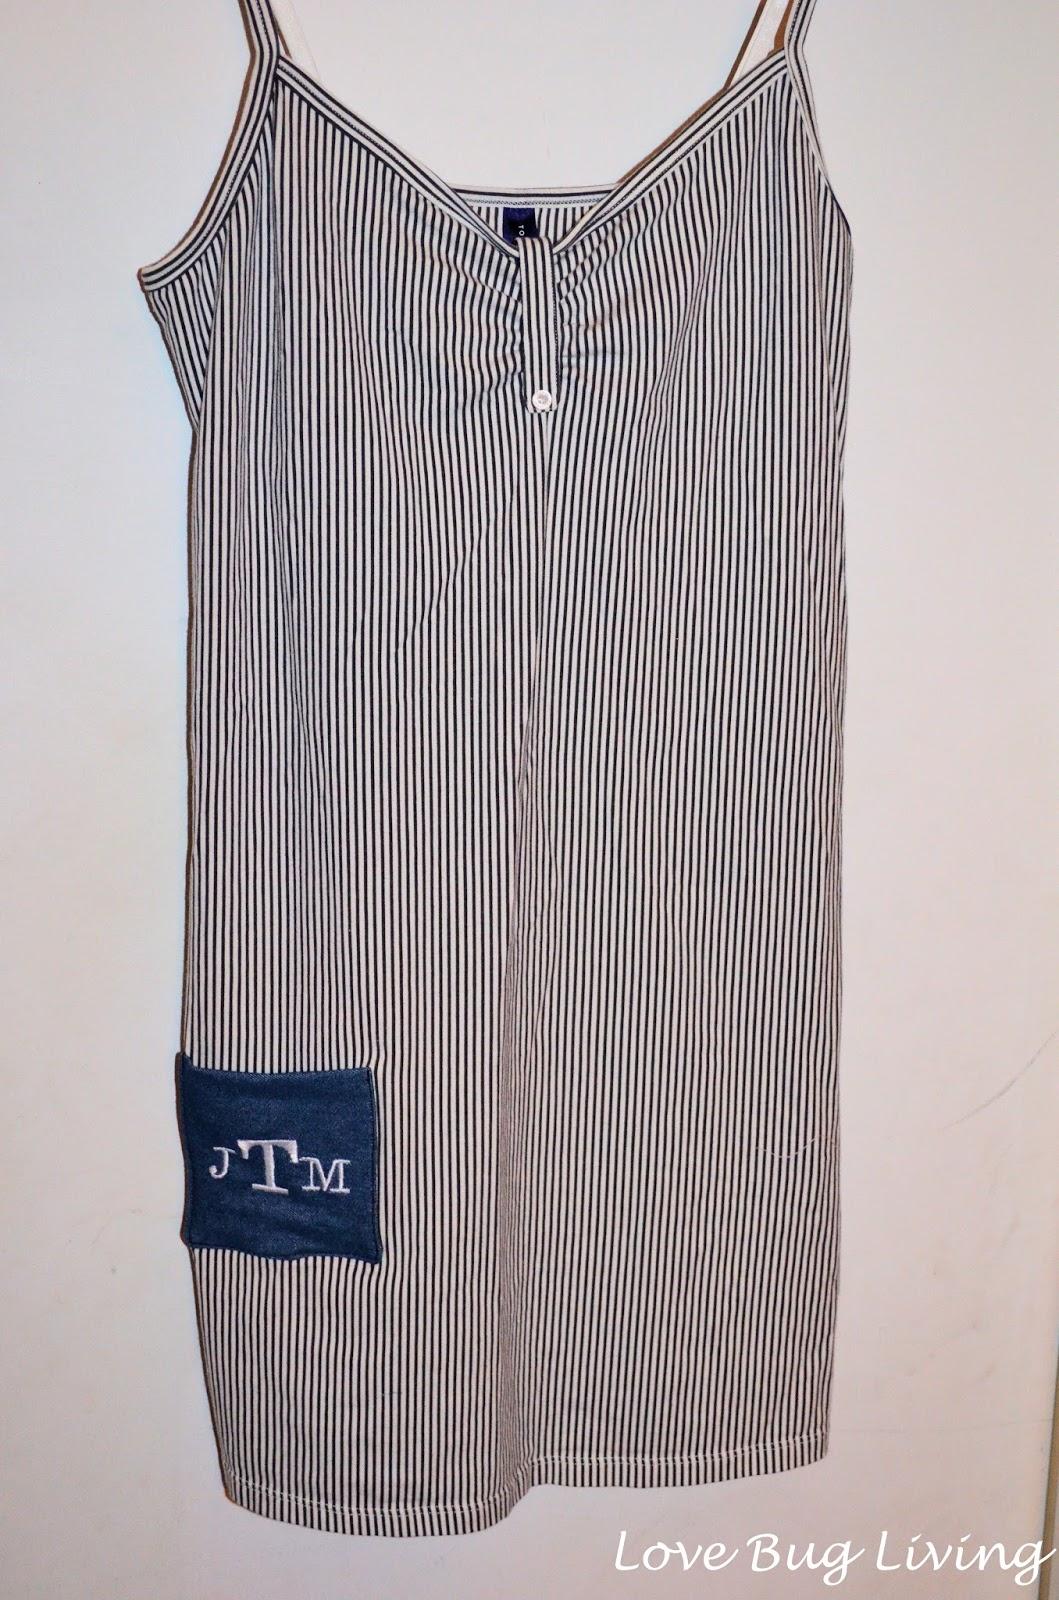 Love Bug Living Monogram Pocket Nightgown